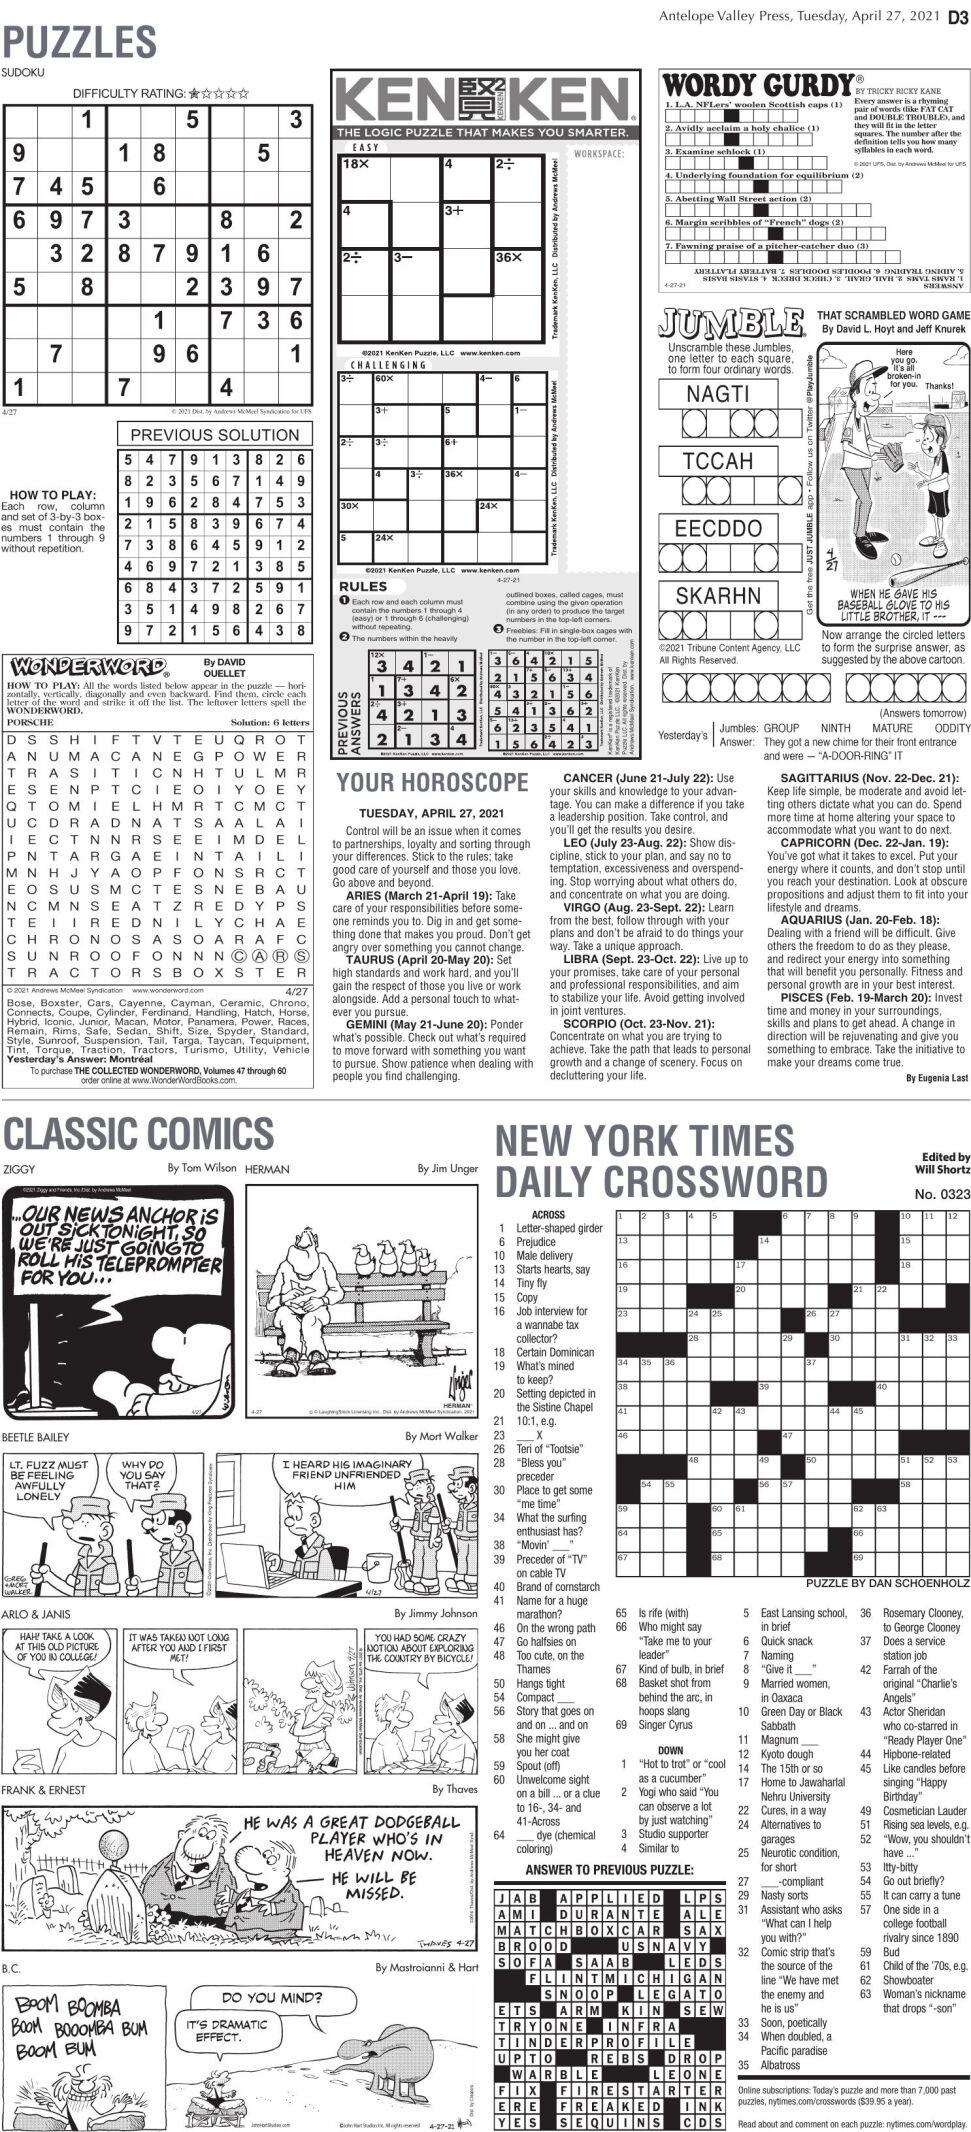 Puzzles, April 27, 2021